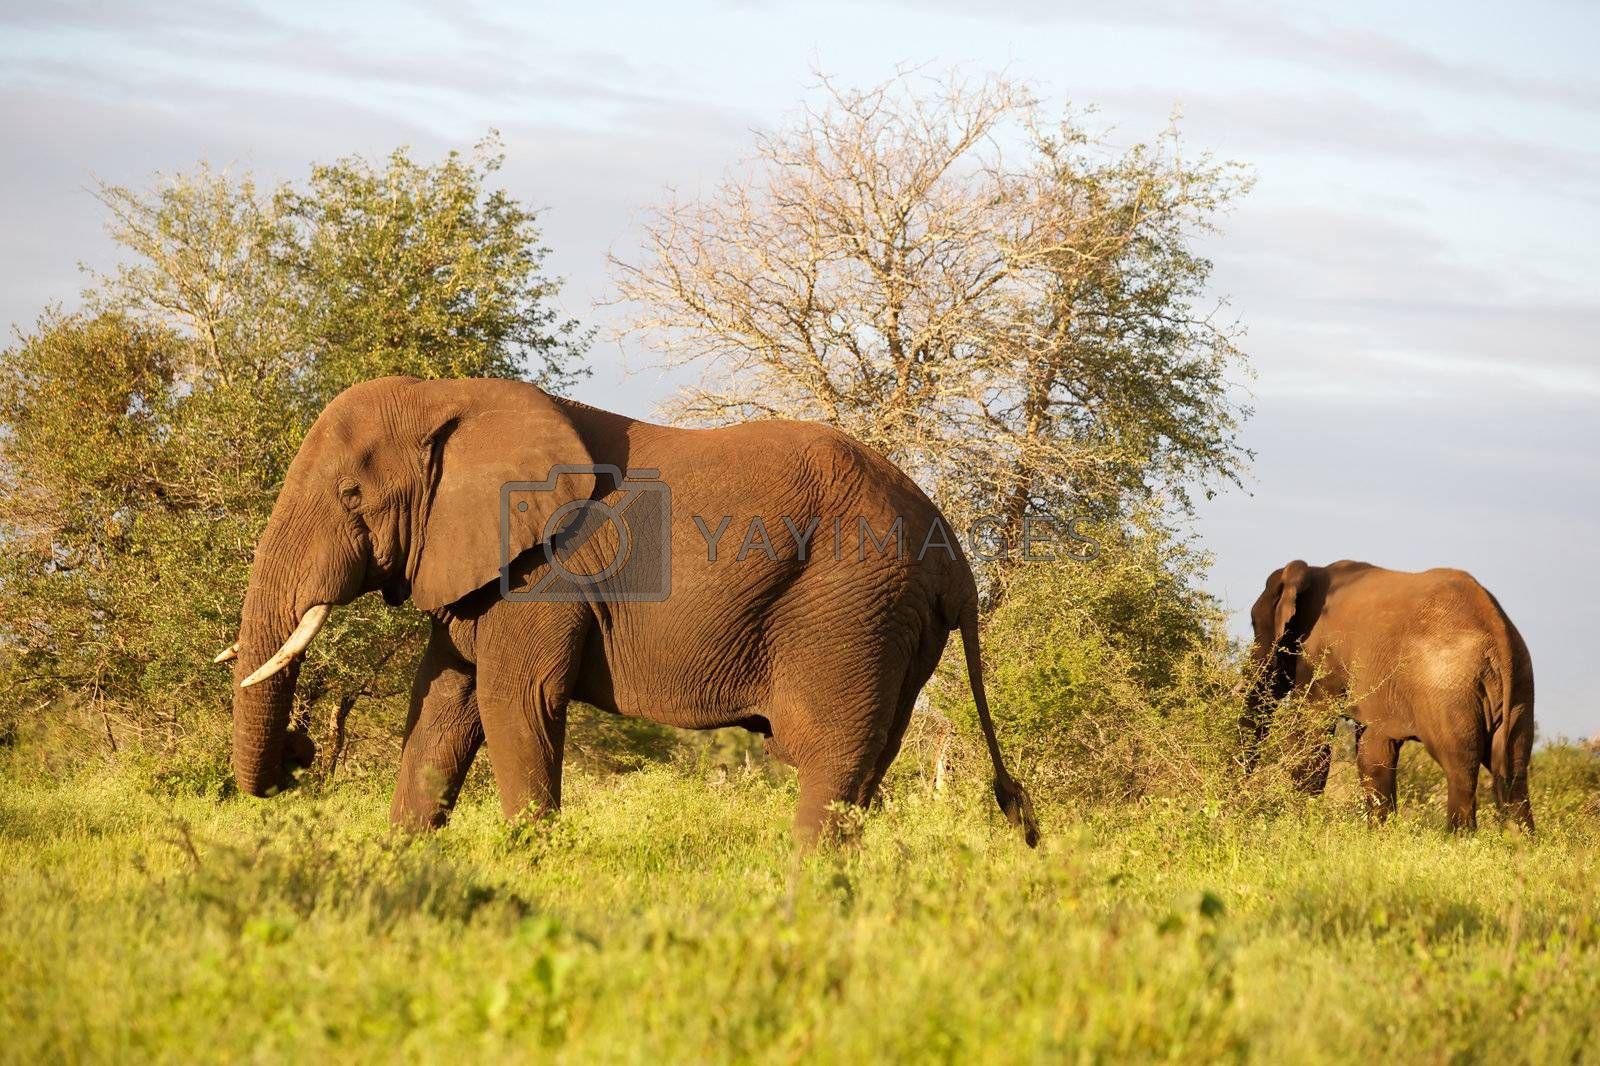 Royalty free image of African Elephant by zambezi